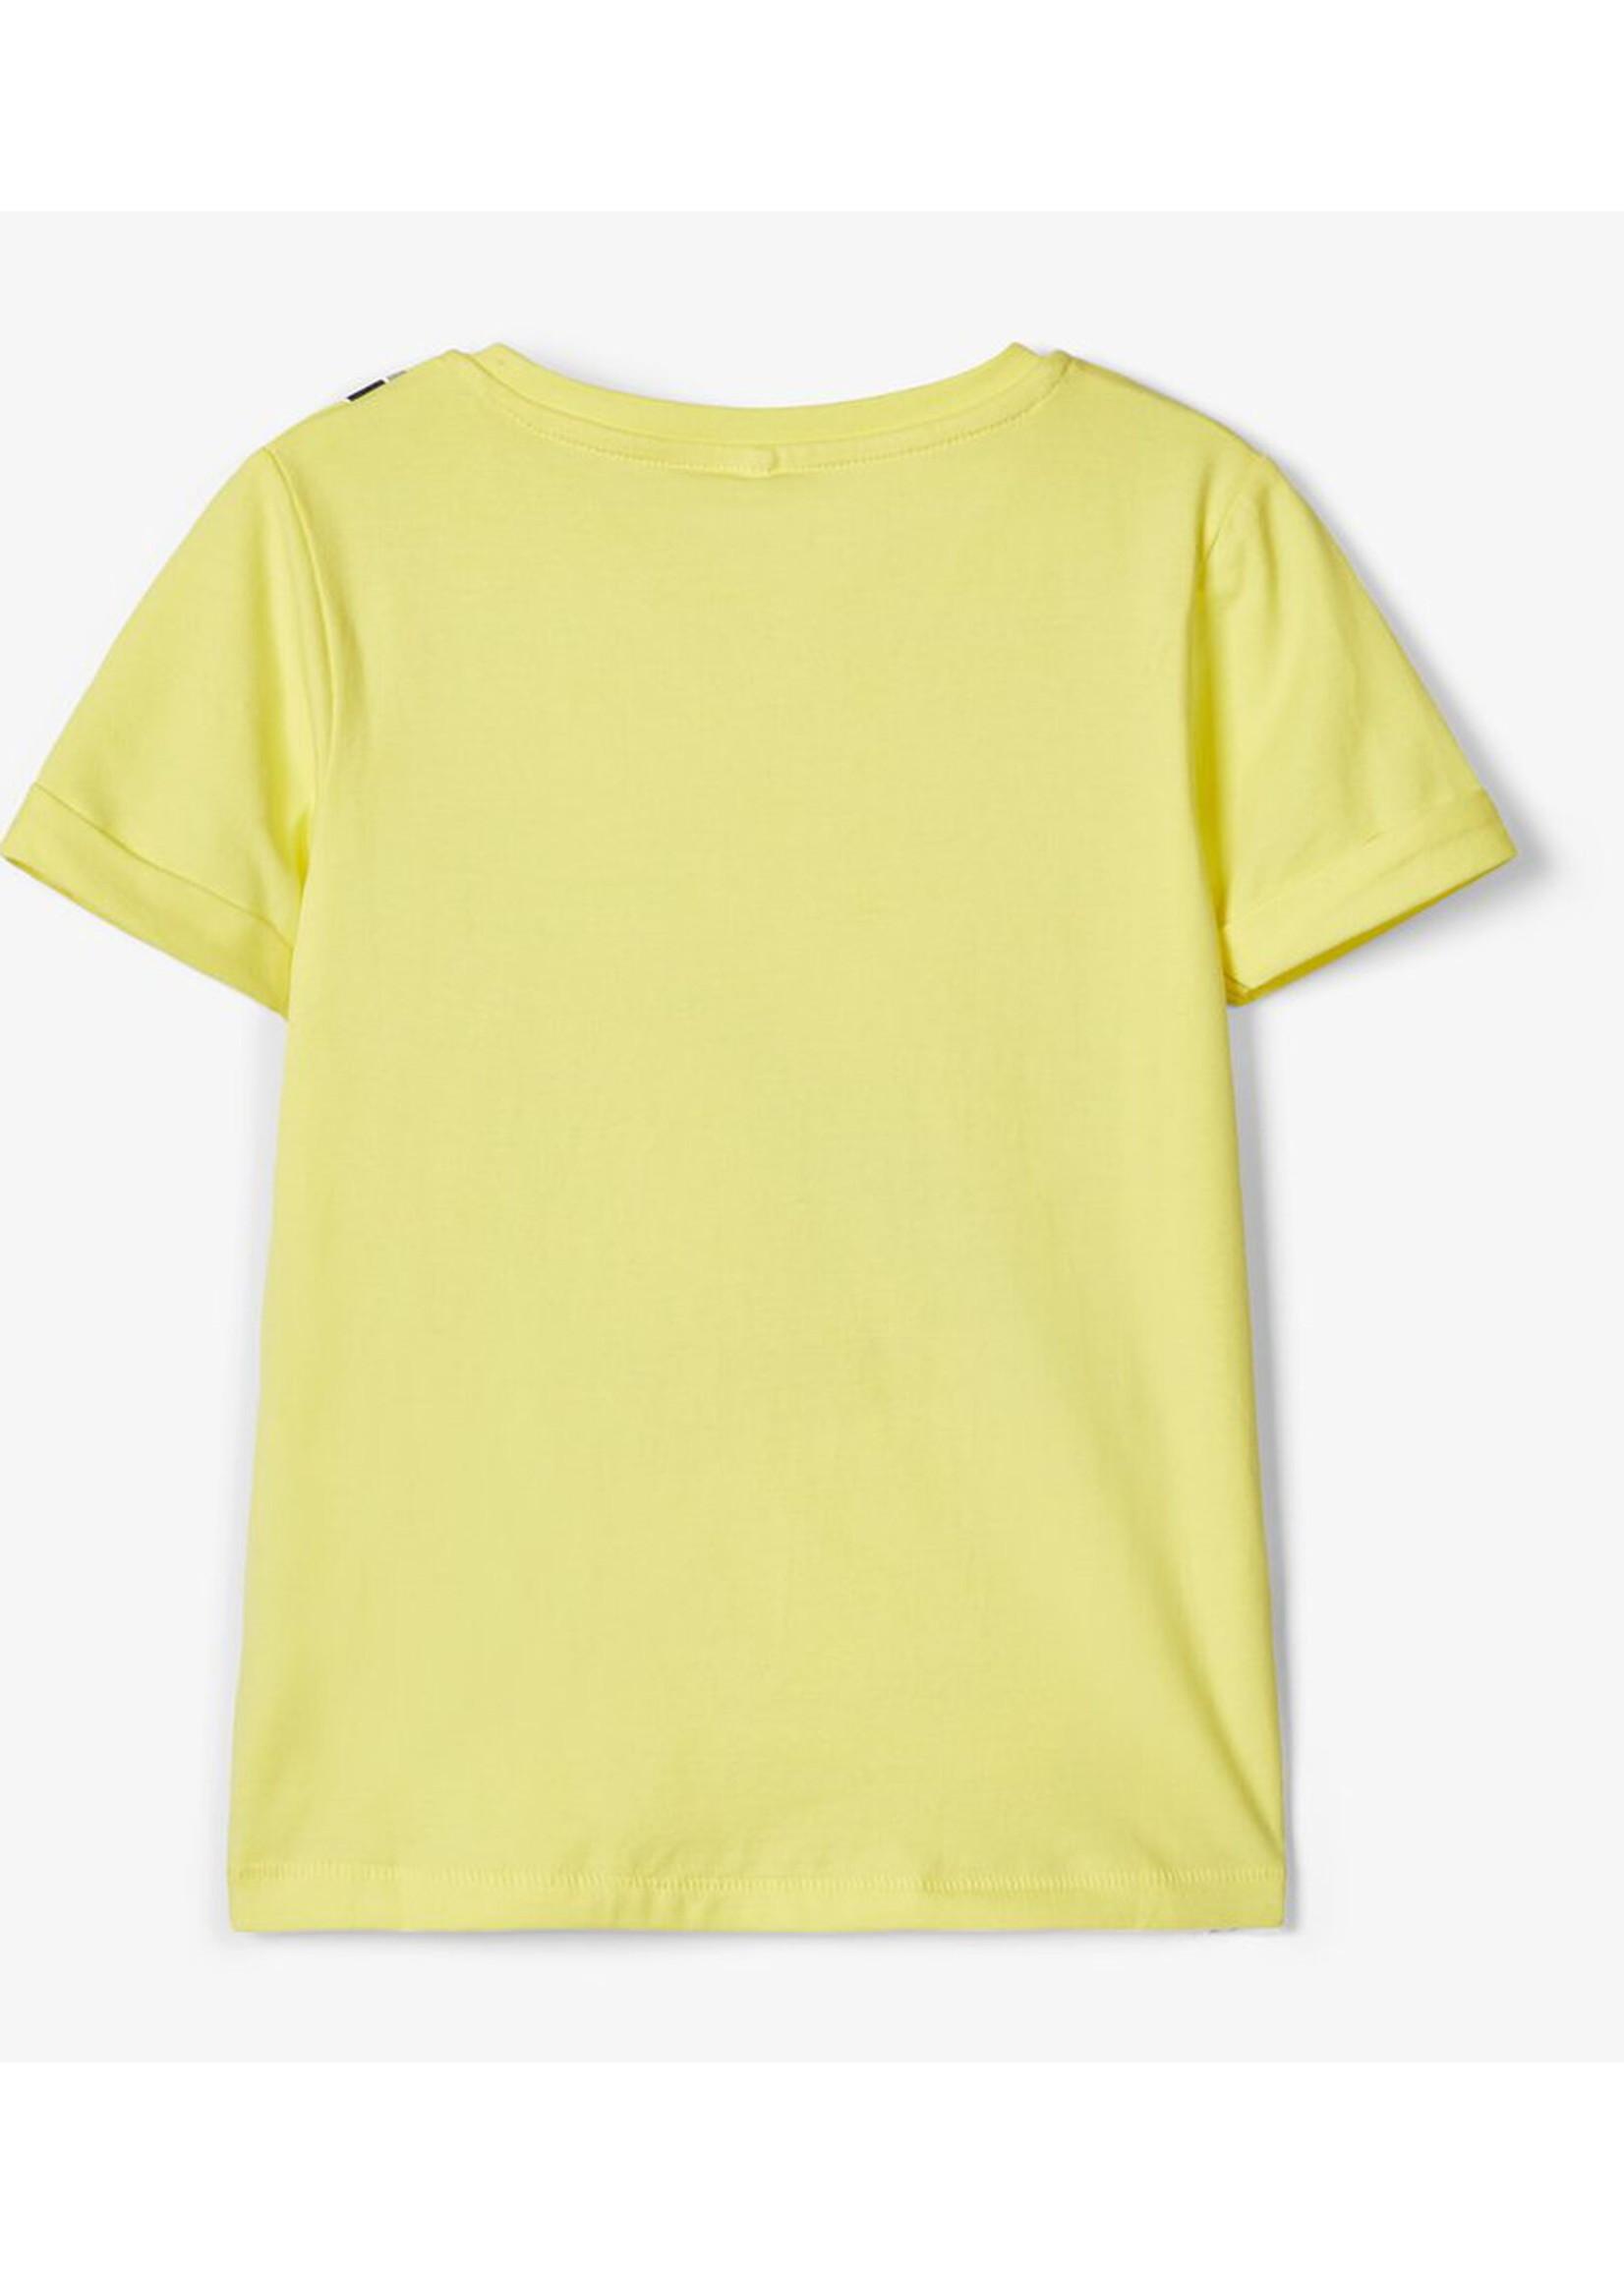 Name it T-shirt maat 80 + 86